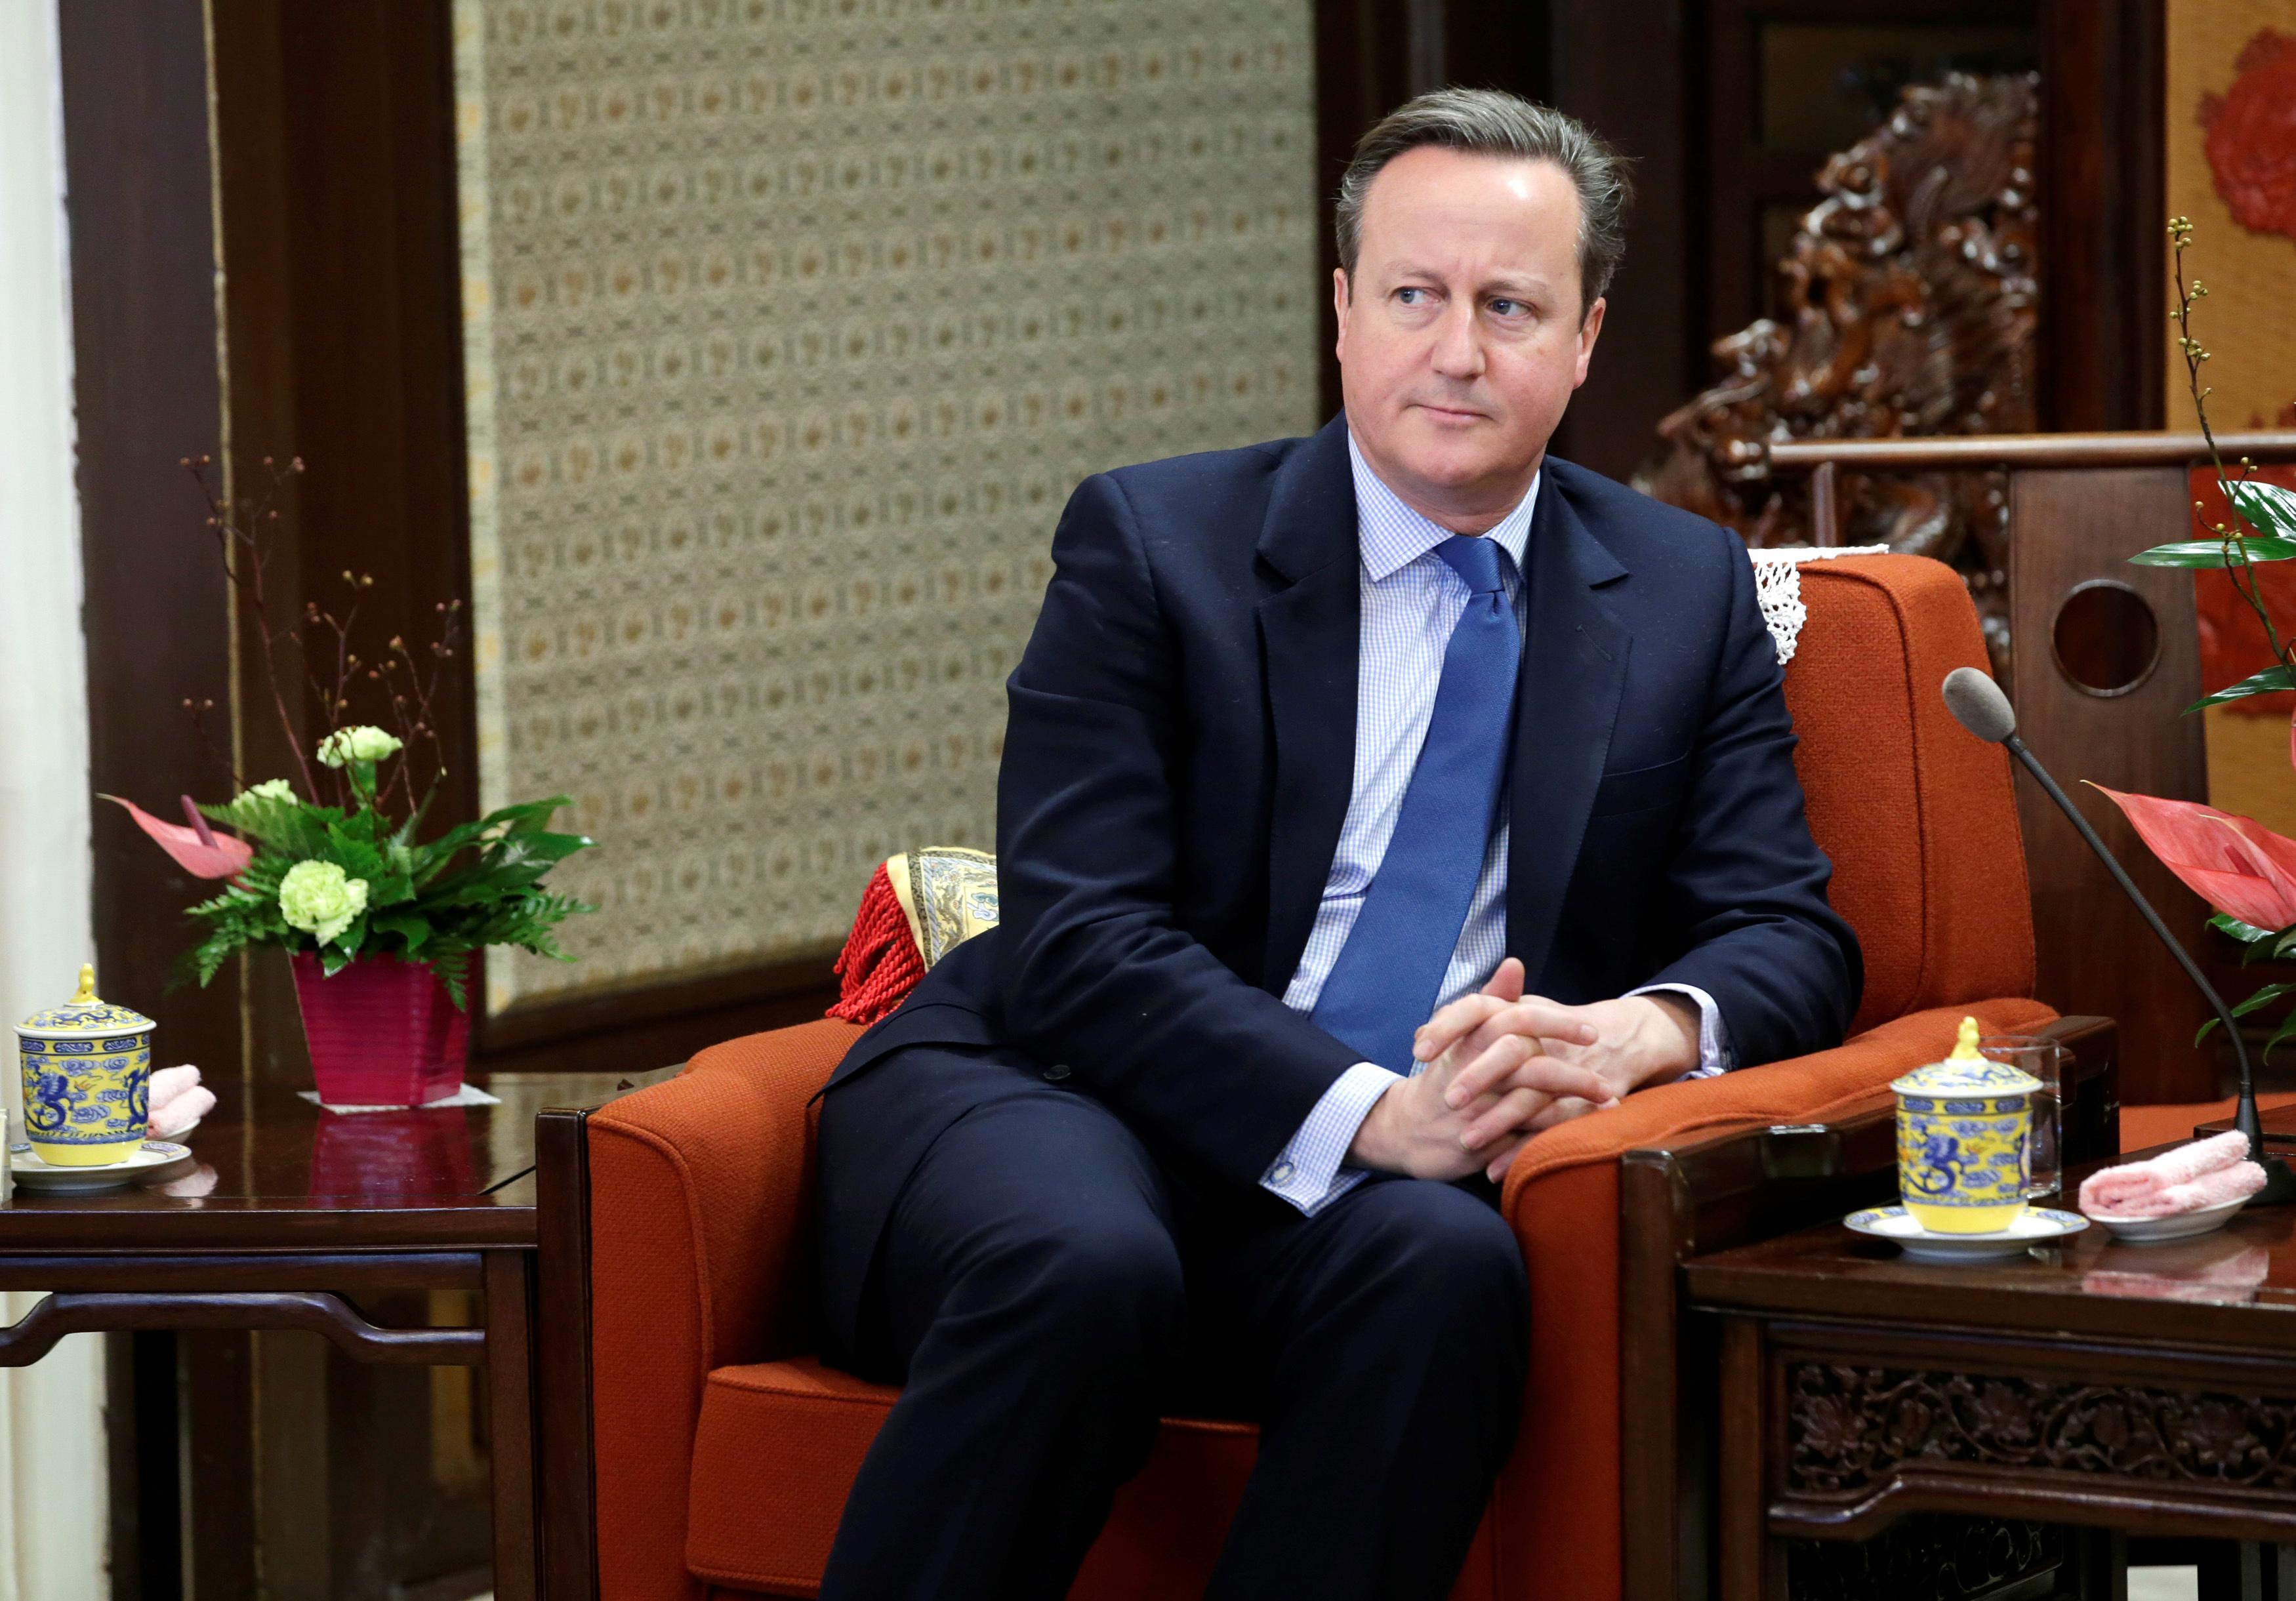 Former British Prime Minister David Cameron meets China's Premier Li Keqiang (not pictured) at Zhongnanhai leadership compound, in Beijing, China, November 27, 2018. REUTERS/Jason Lee/Pool